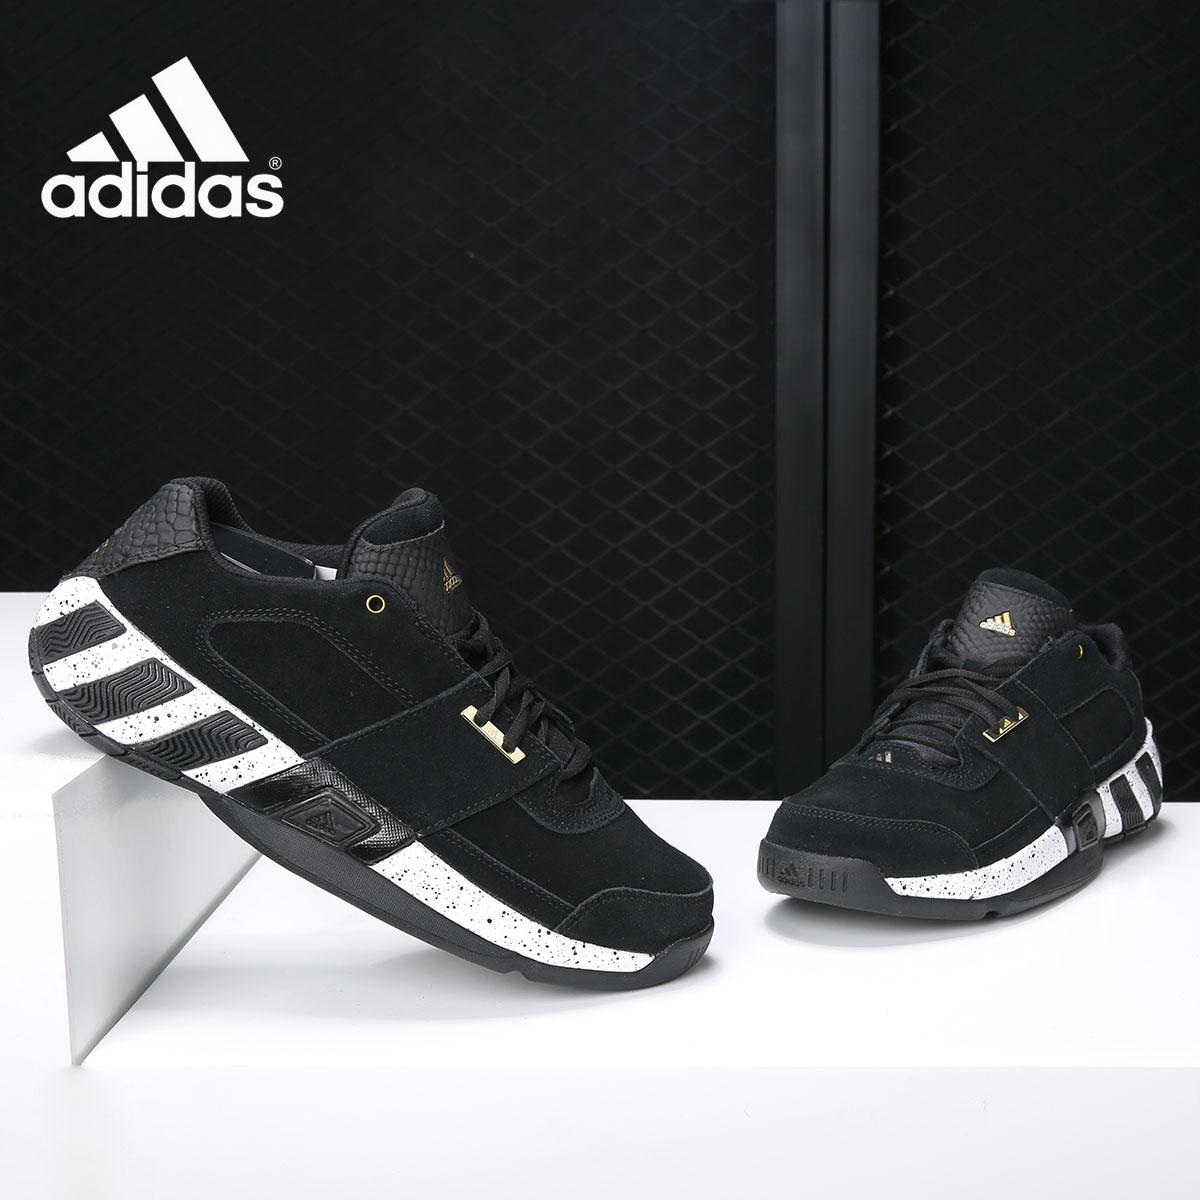 Adidas/阿迪达斯正品 Regulate 阿里纳斯战靴休闲篮球鞋 CG5278